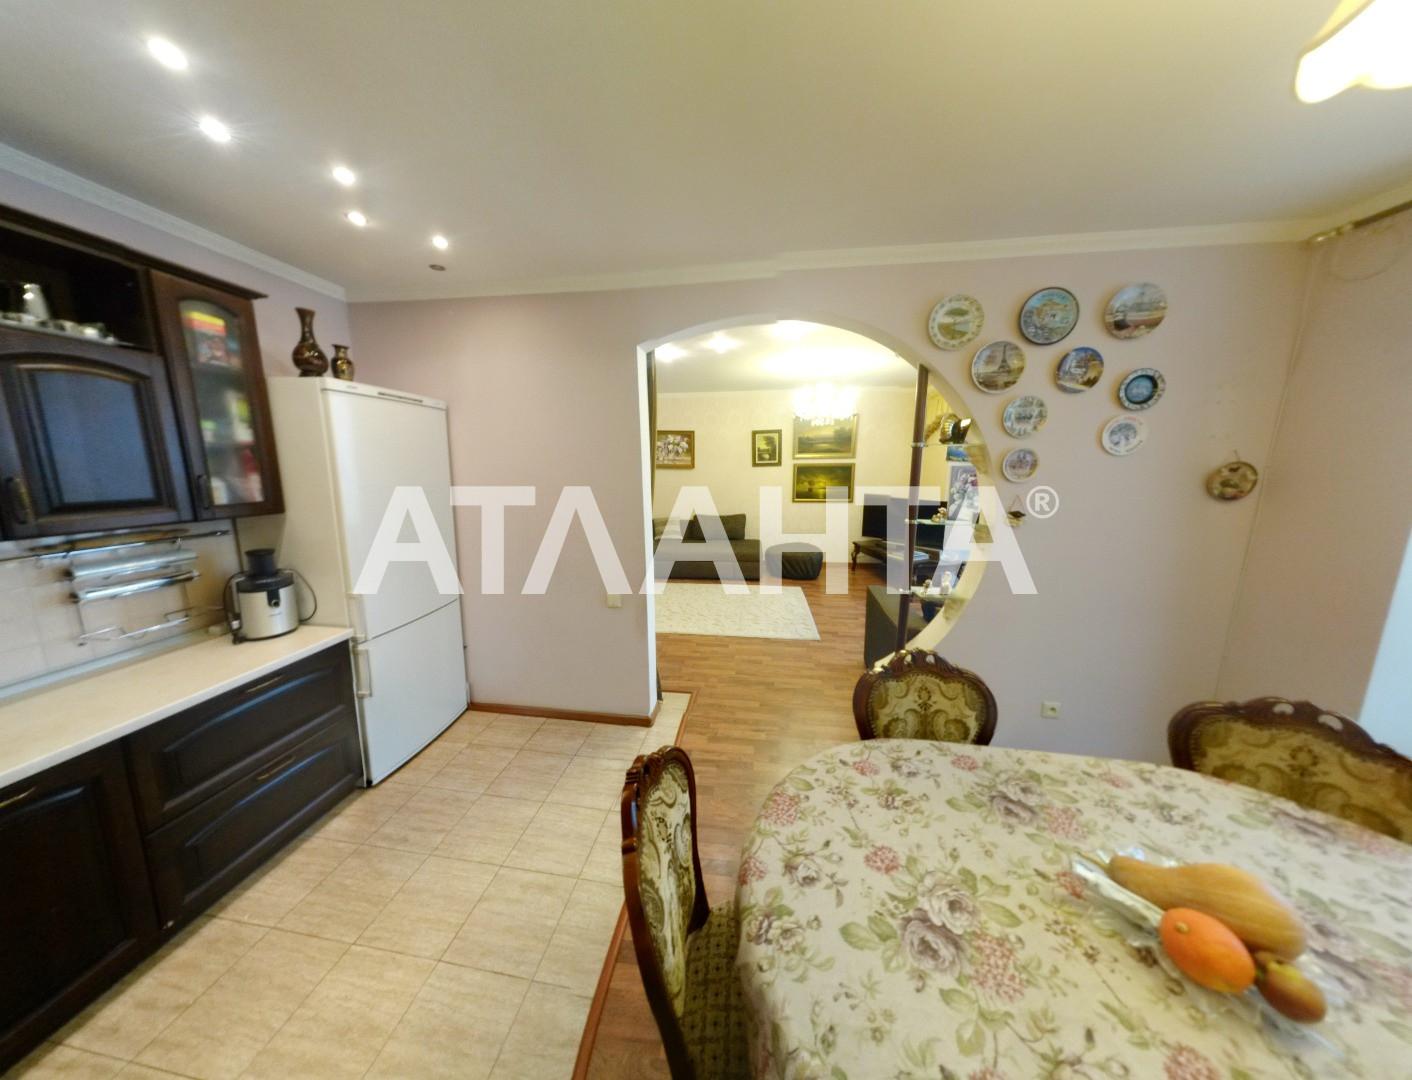 Продается 3-комнатная Квартира на ул. Ул. Ломоносова — 139 600 у.е. (фото №7)